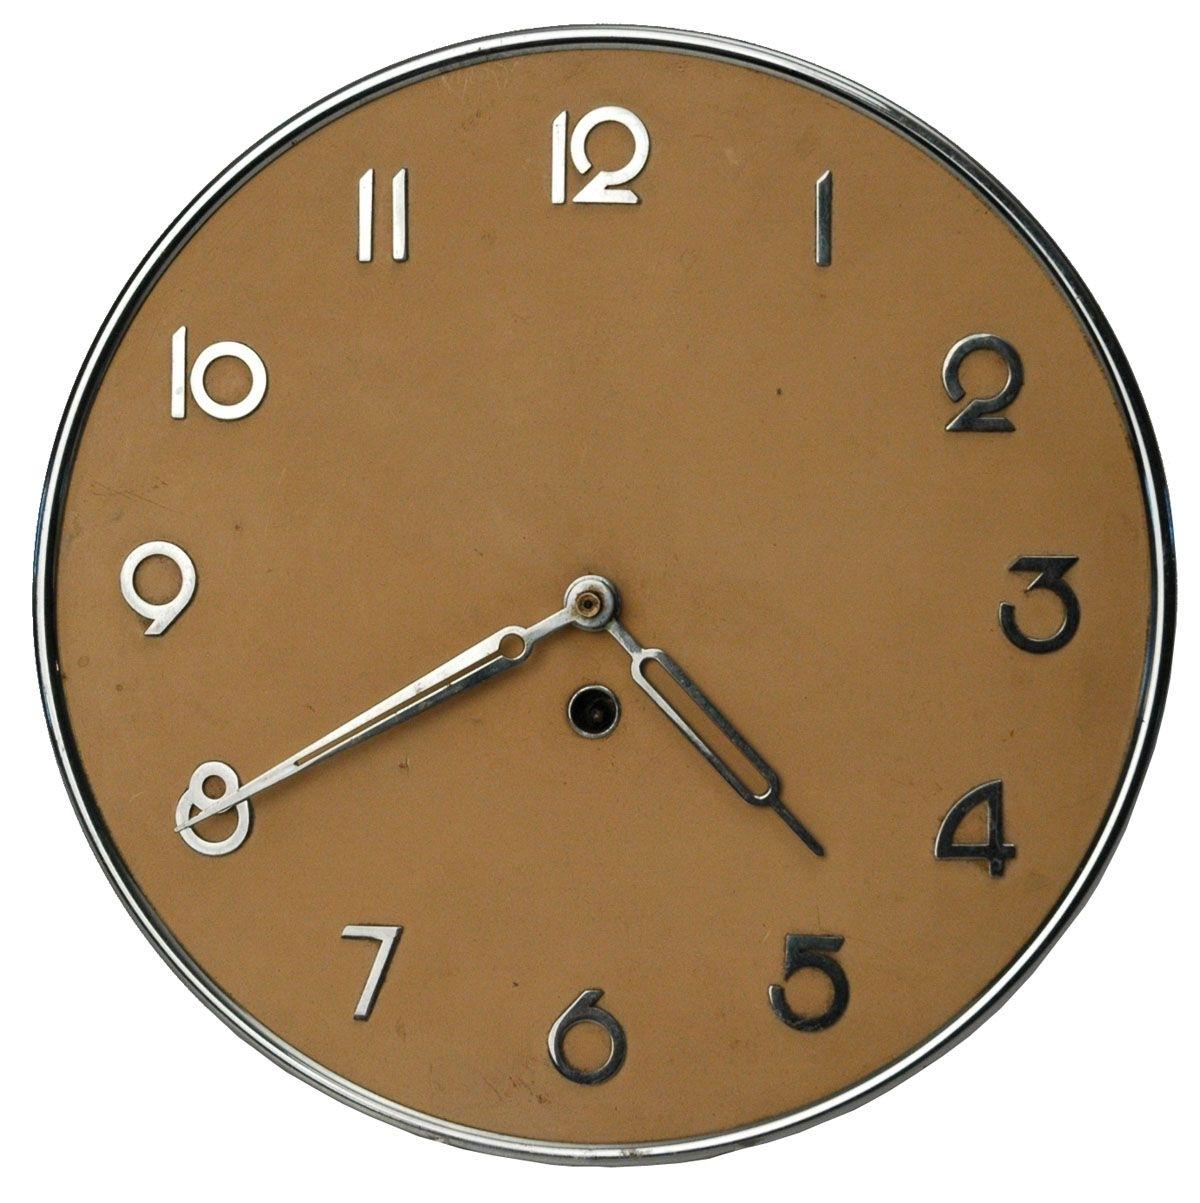 Sleek Art Deco Modernism German Kienzle Wall Clock | Homewares pertaining to Art Deco Wall Clock (Image 19 of 20)